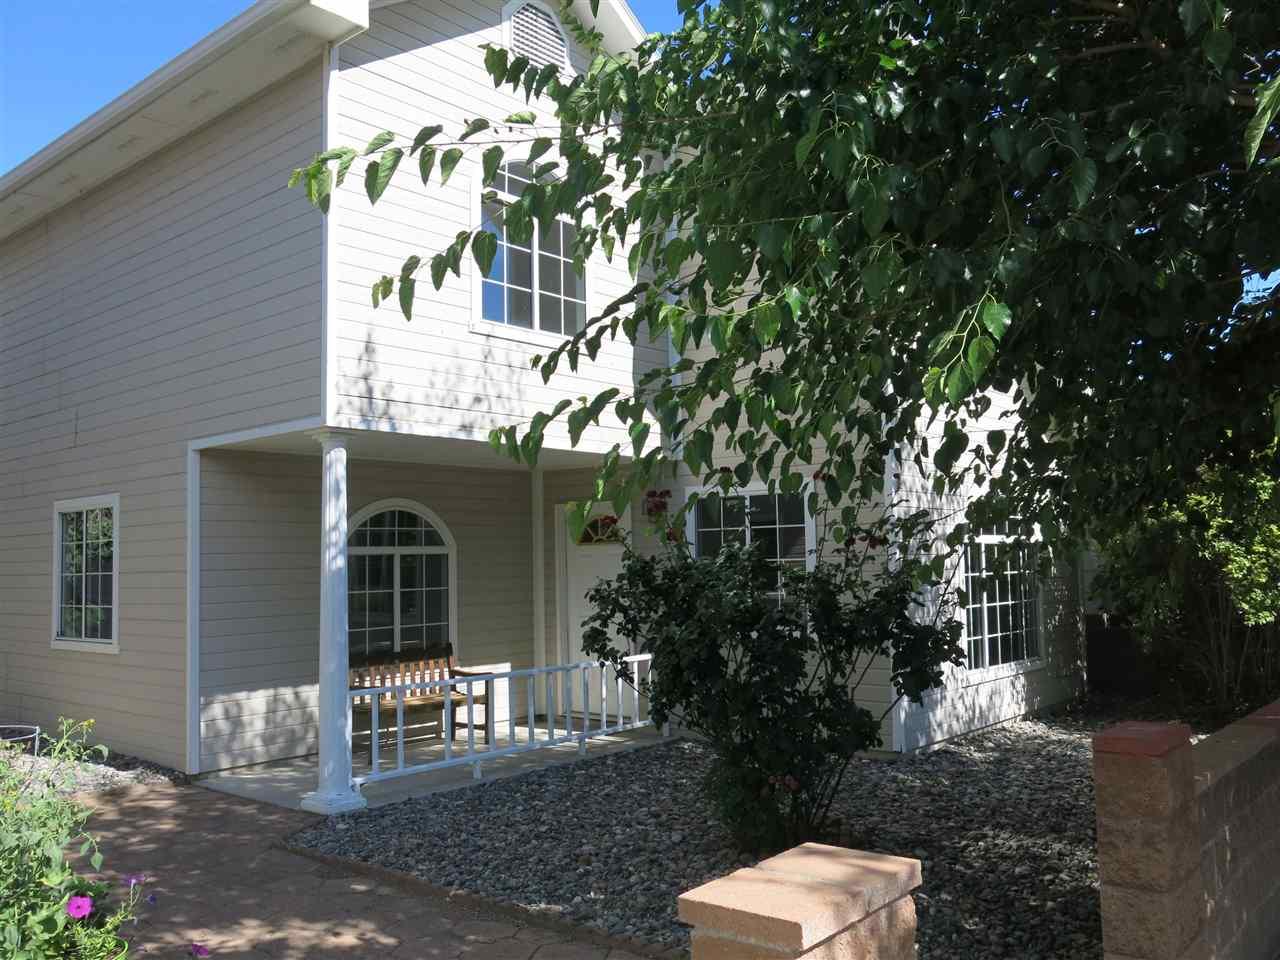 3036 1/2 Stoneybrook Lane, Grand Junction, CO 81504